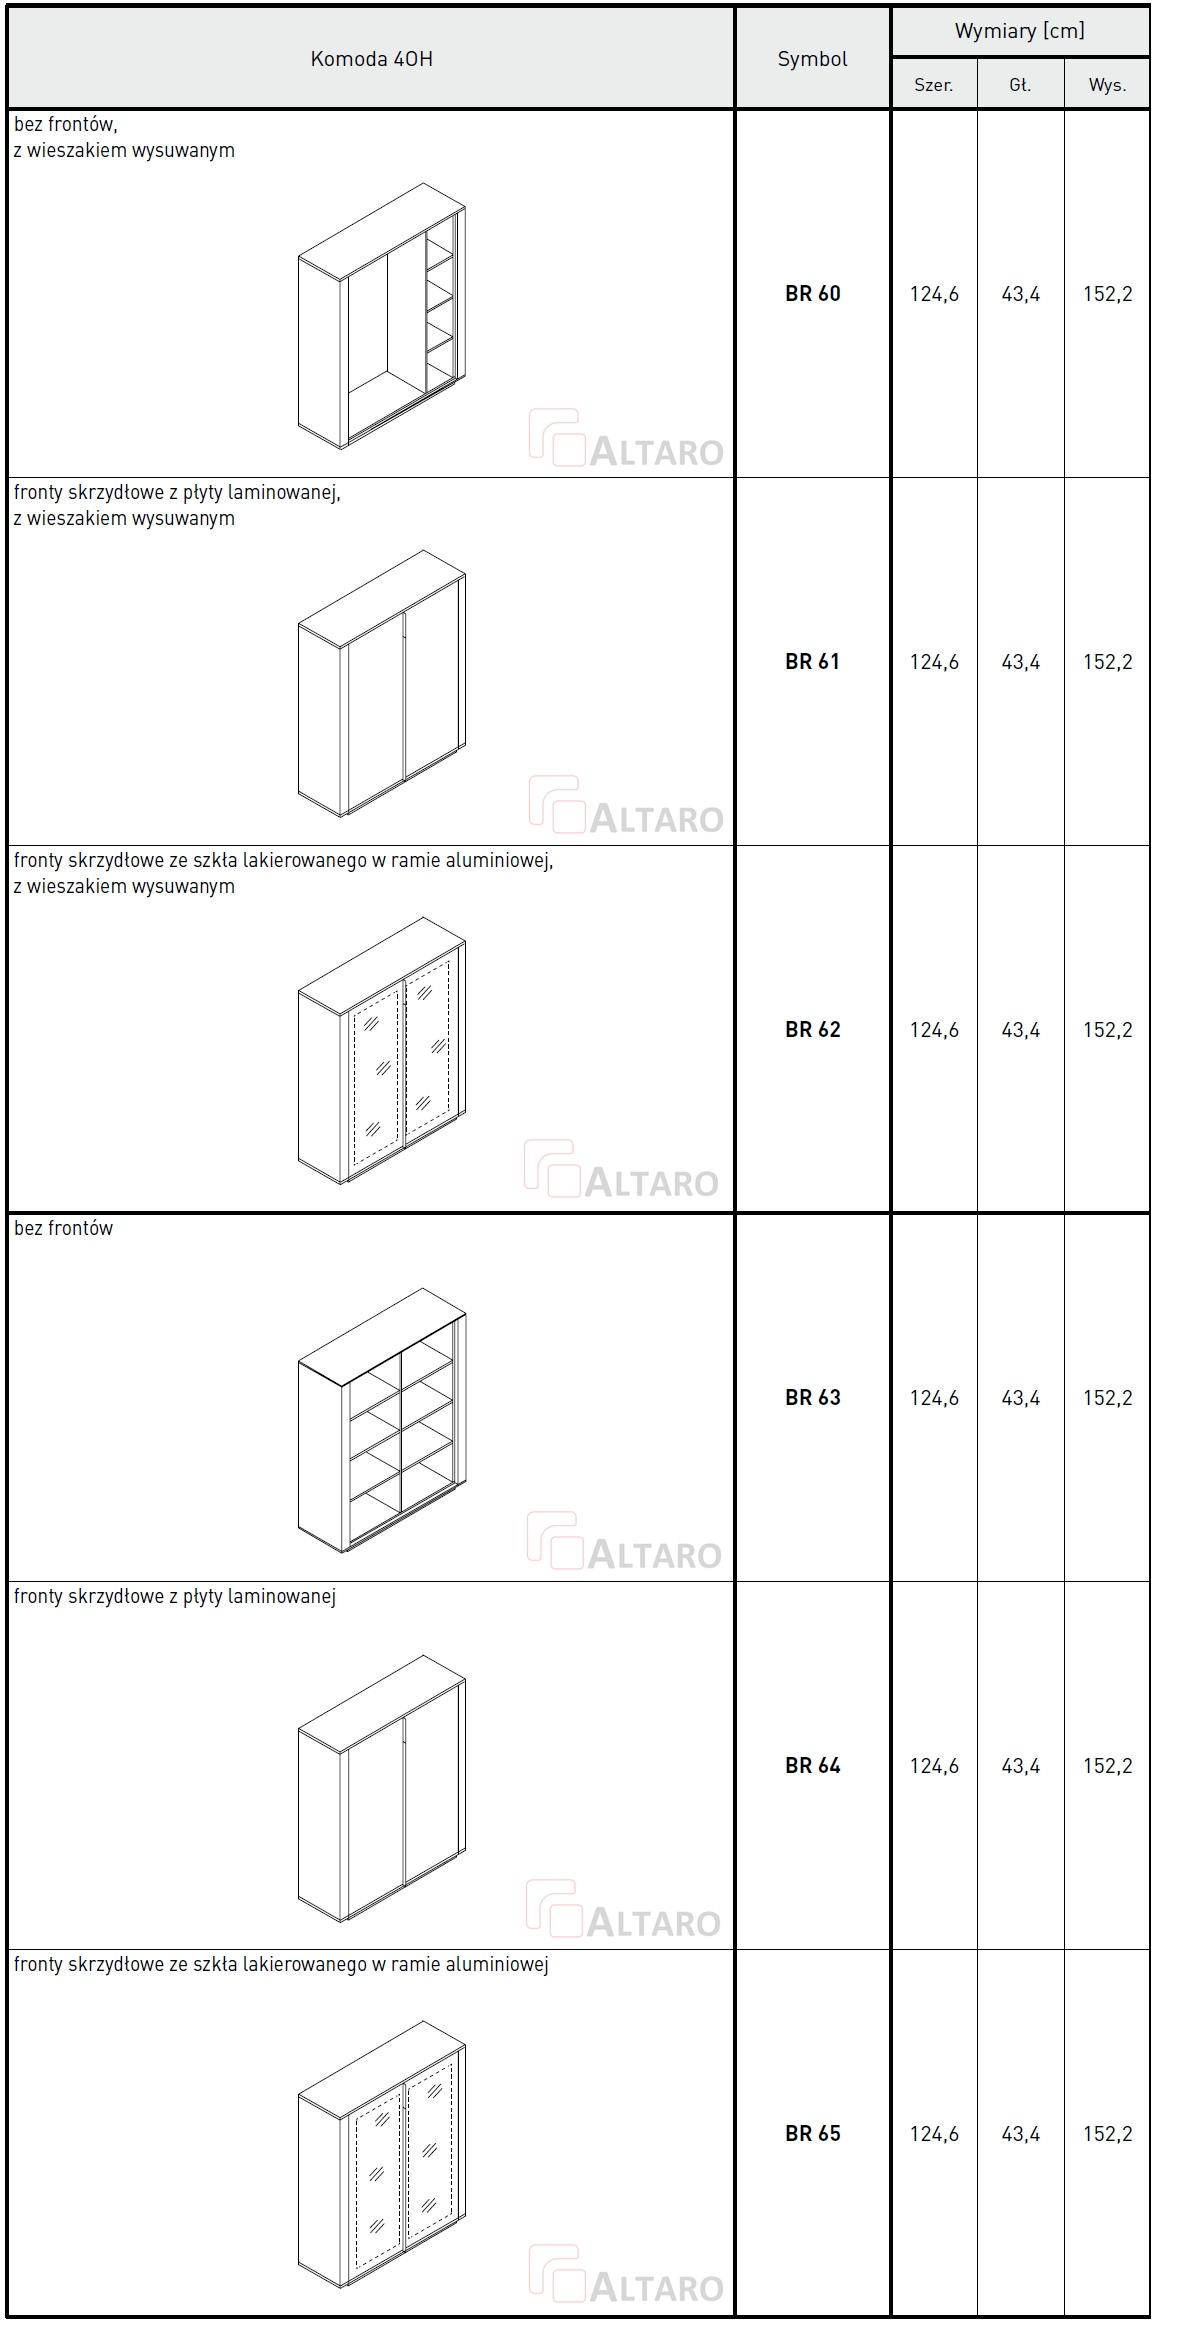 meble gabinetowe BRAND katalog v10 ALTARO